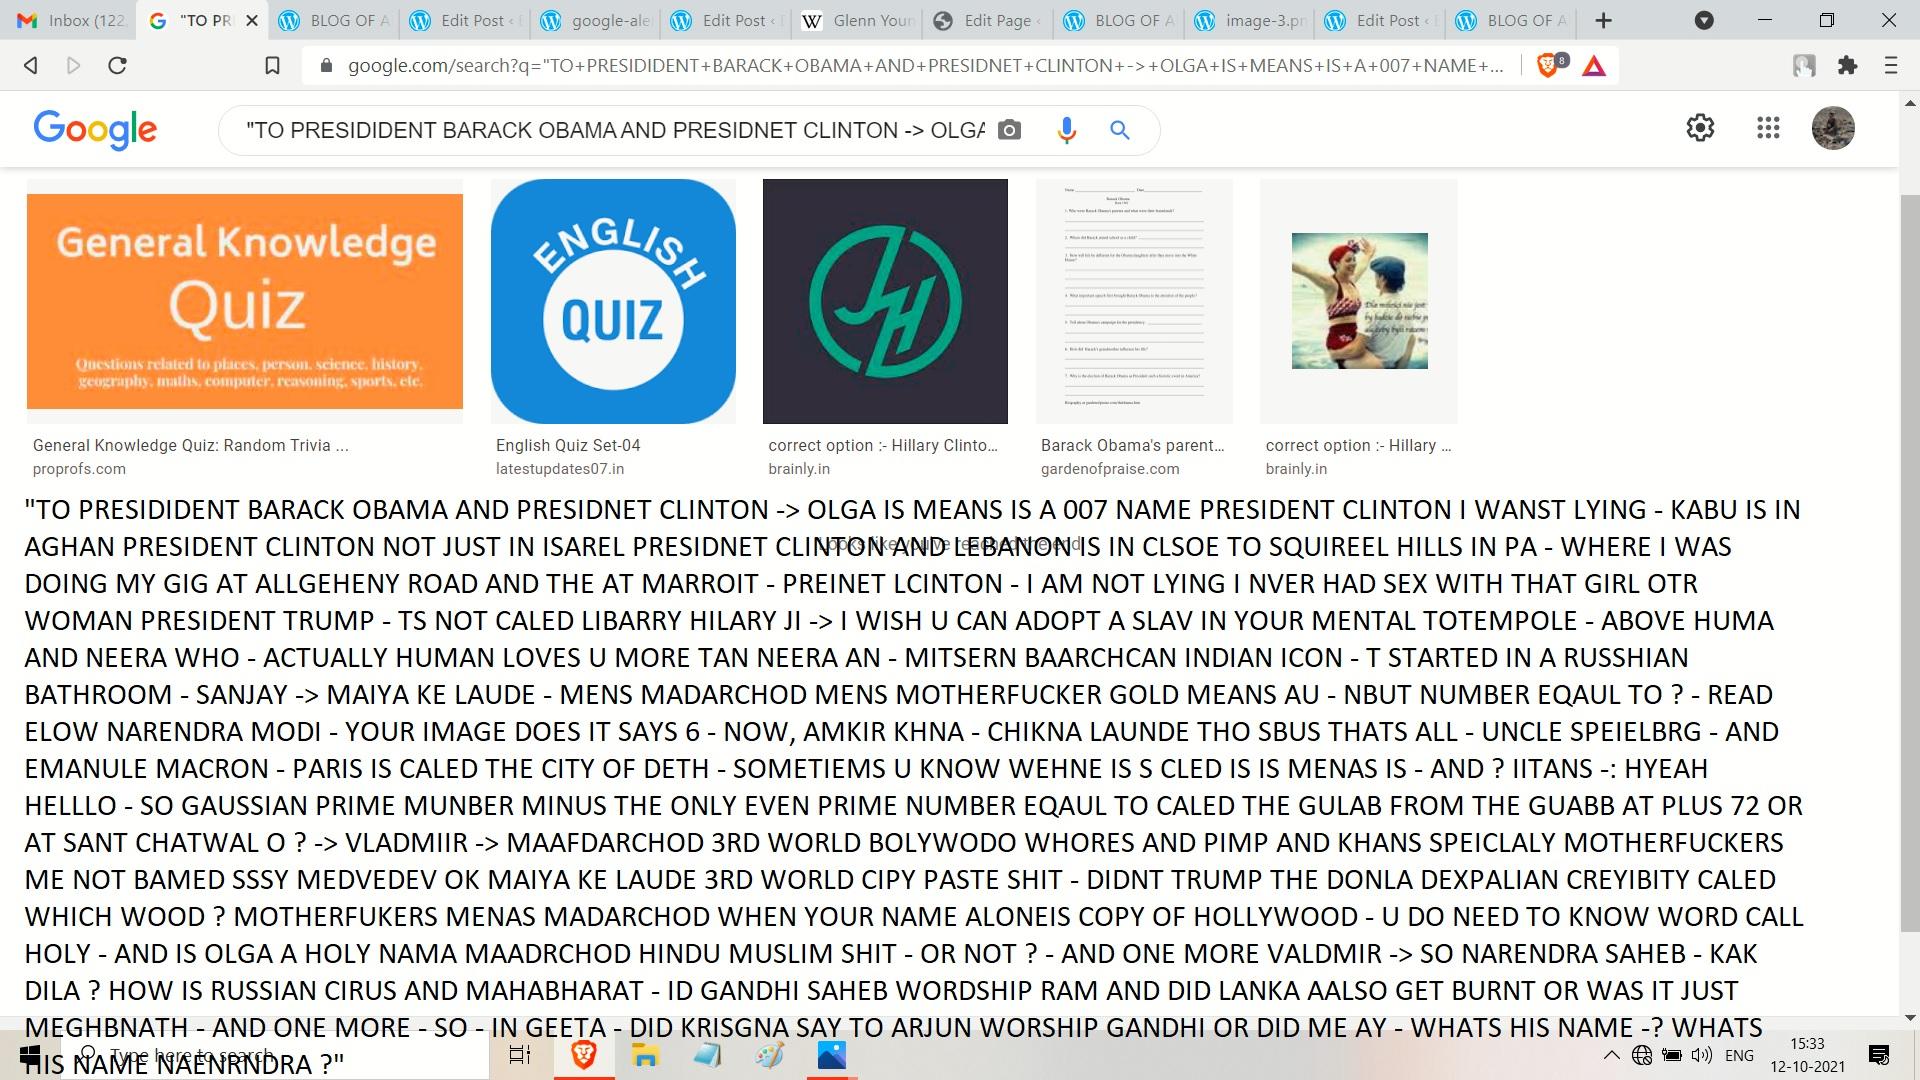 TO PRESIDENT OABMA - FROM ME - AND OLGA LEDNICHENKO WORD HEARD BAARCK OR JUST FAMEKS SHIT BOND